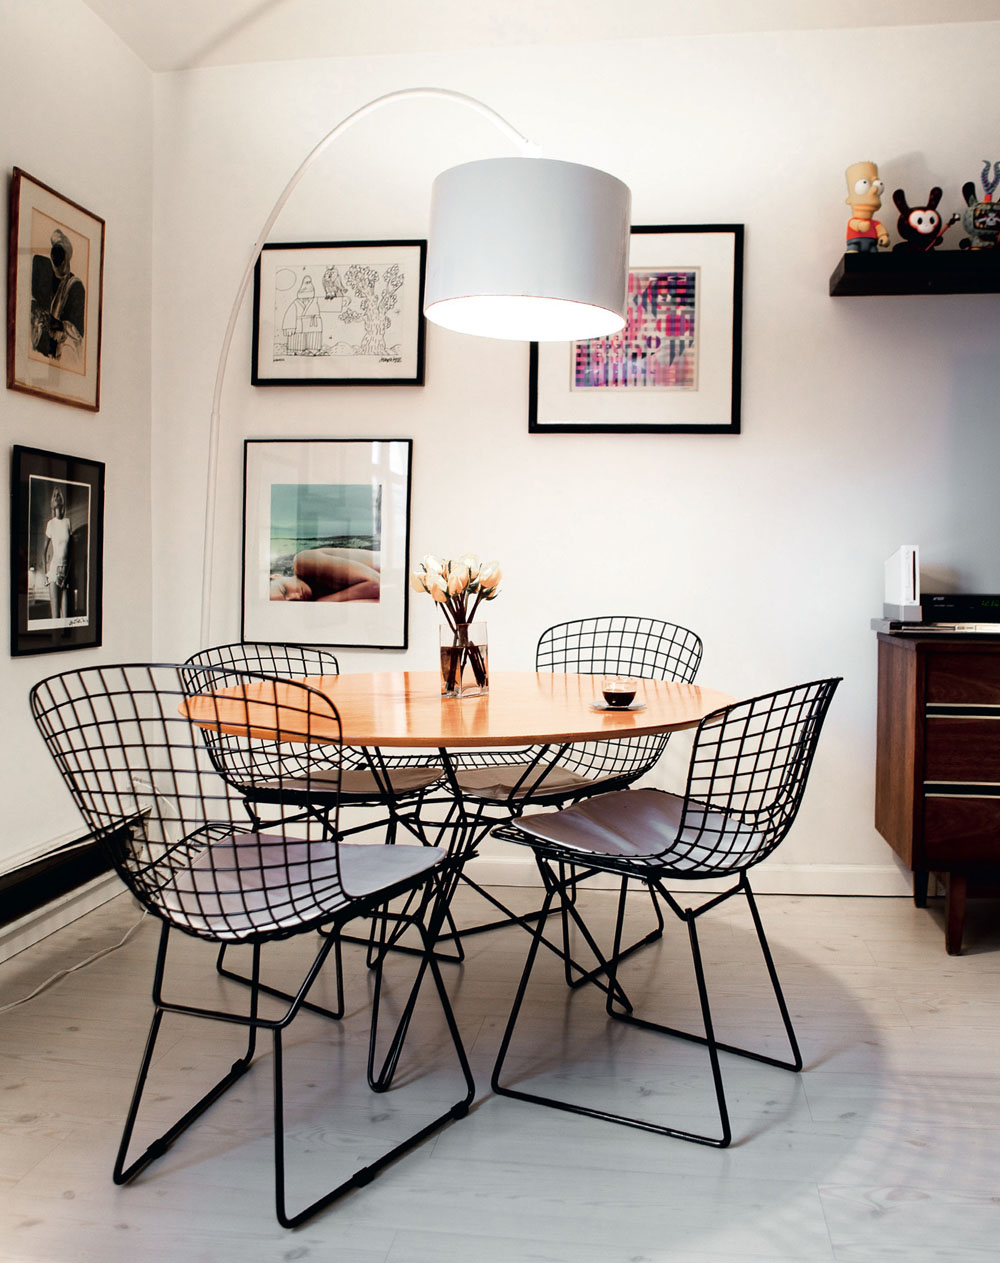 Mesas de comedor modernas 2017 todos los modelos hoy for Muebles de comedor mesas